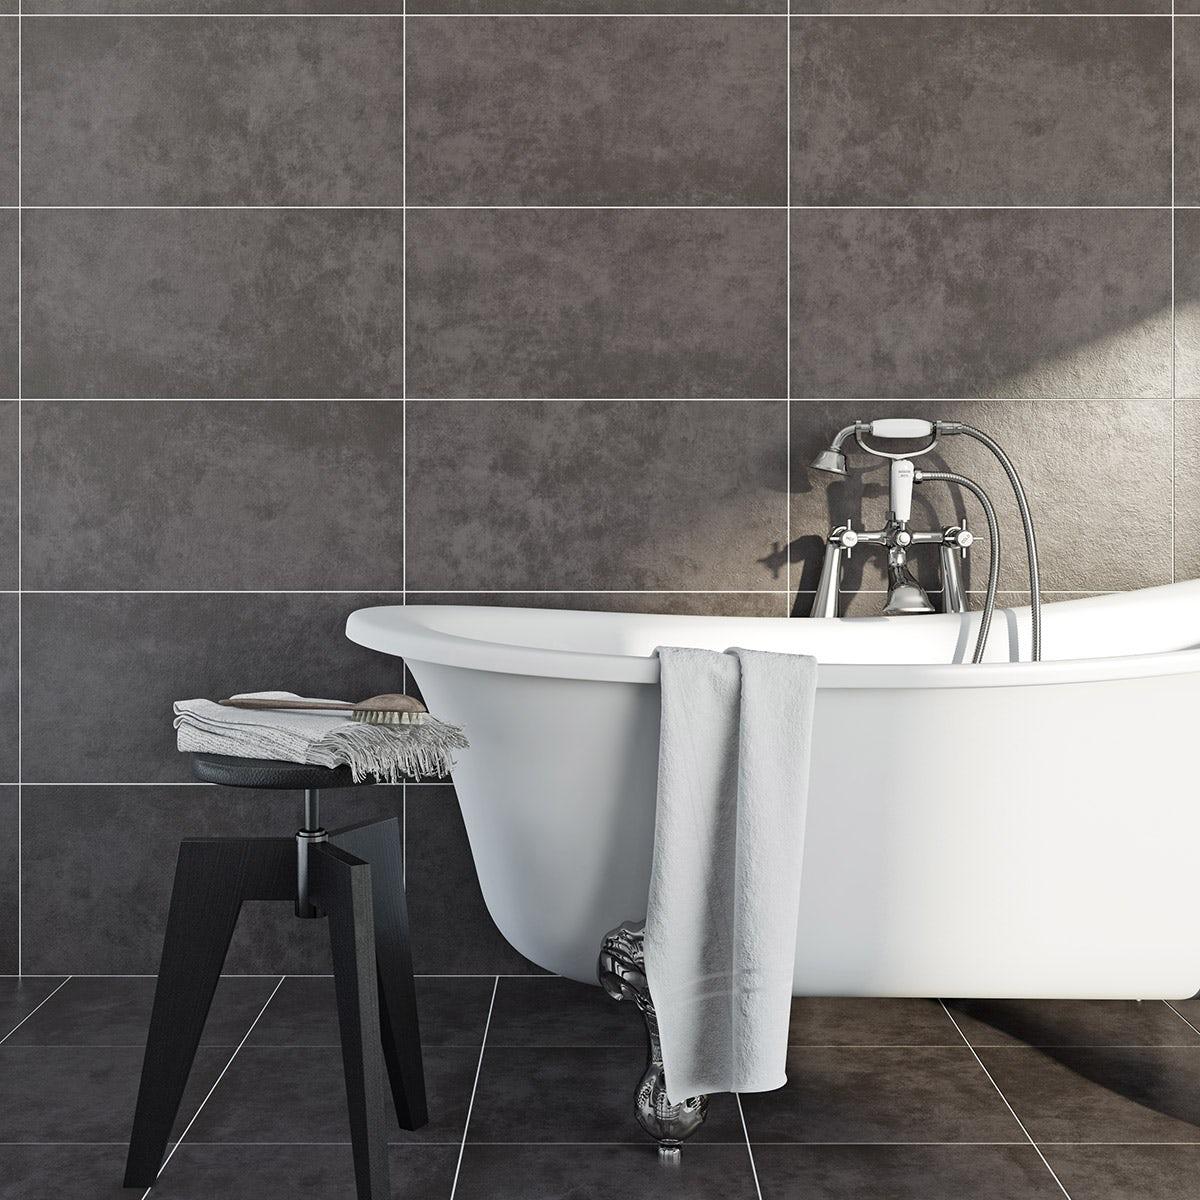 Charcoal grey bathroom tiles - British Ceramic Tile Canvas Charcoal Grey Matt Tile 298mm X 598mm